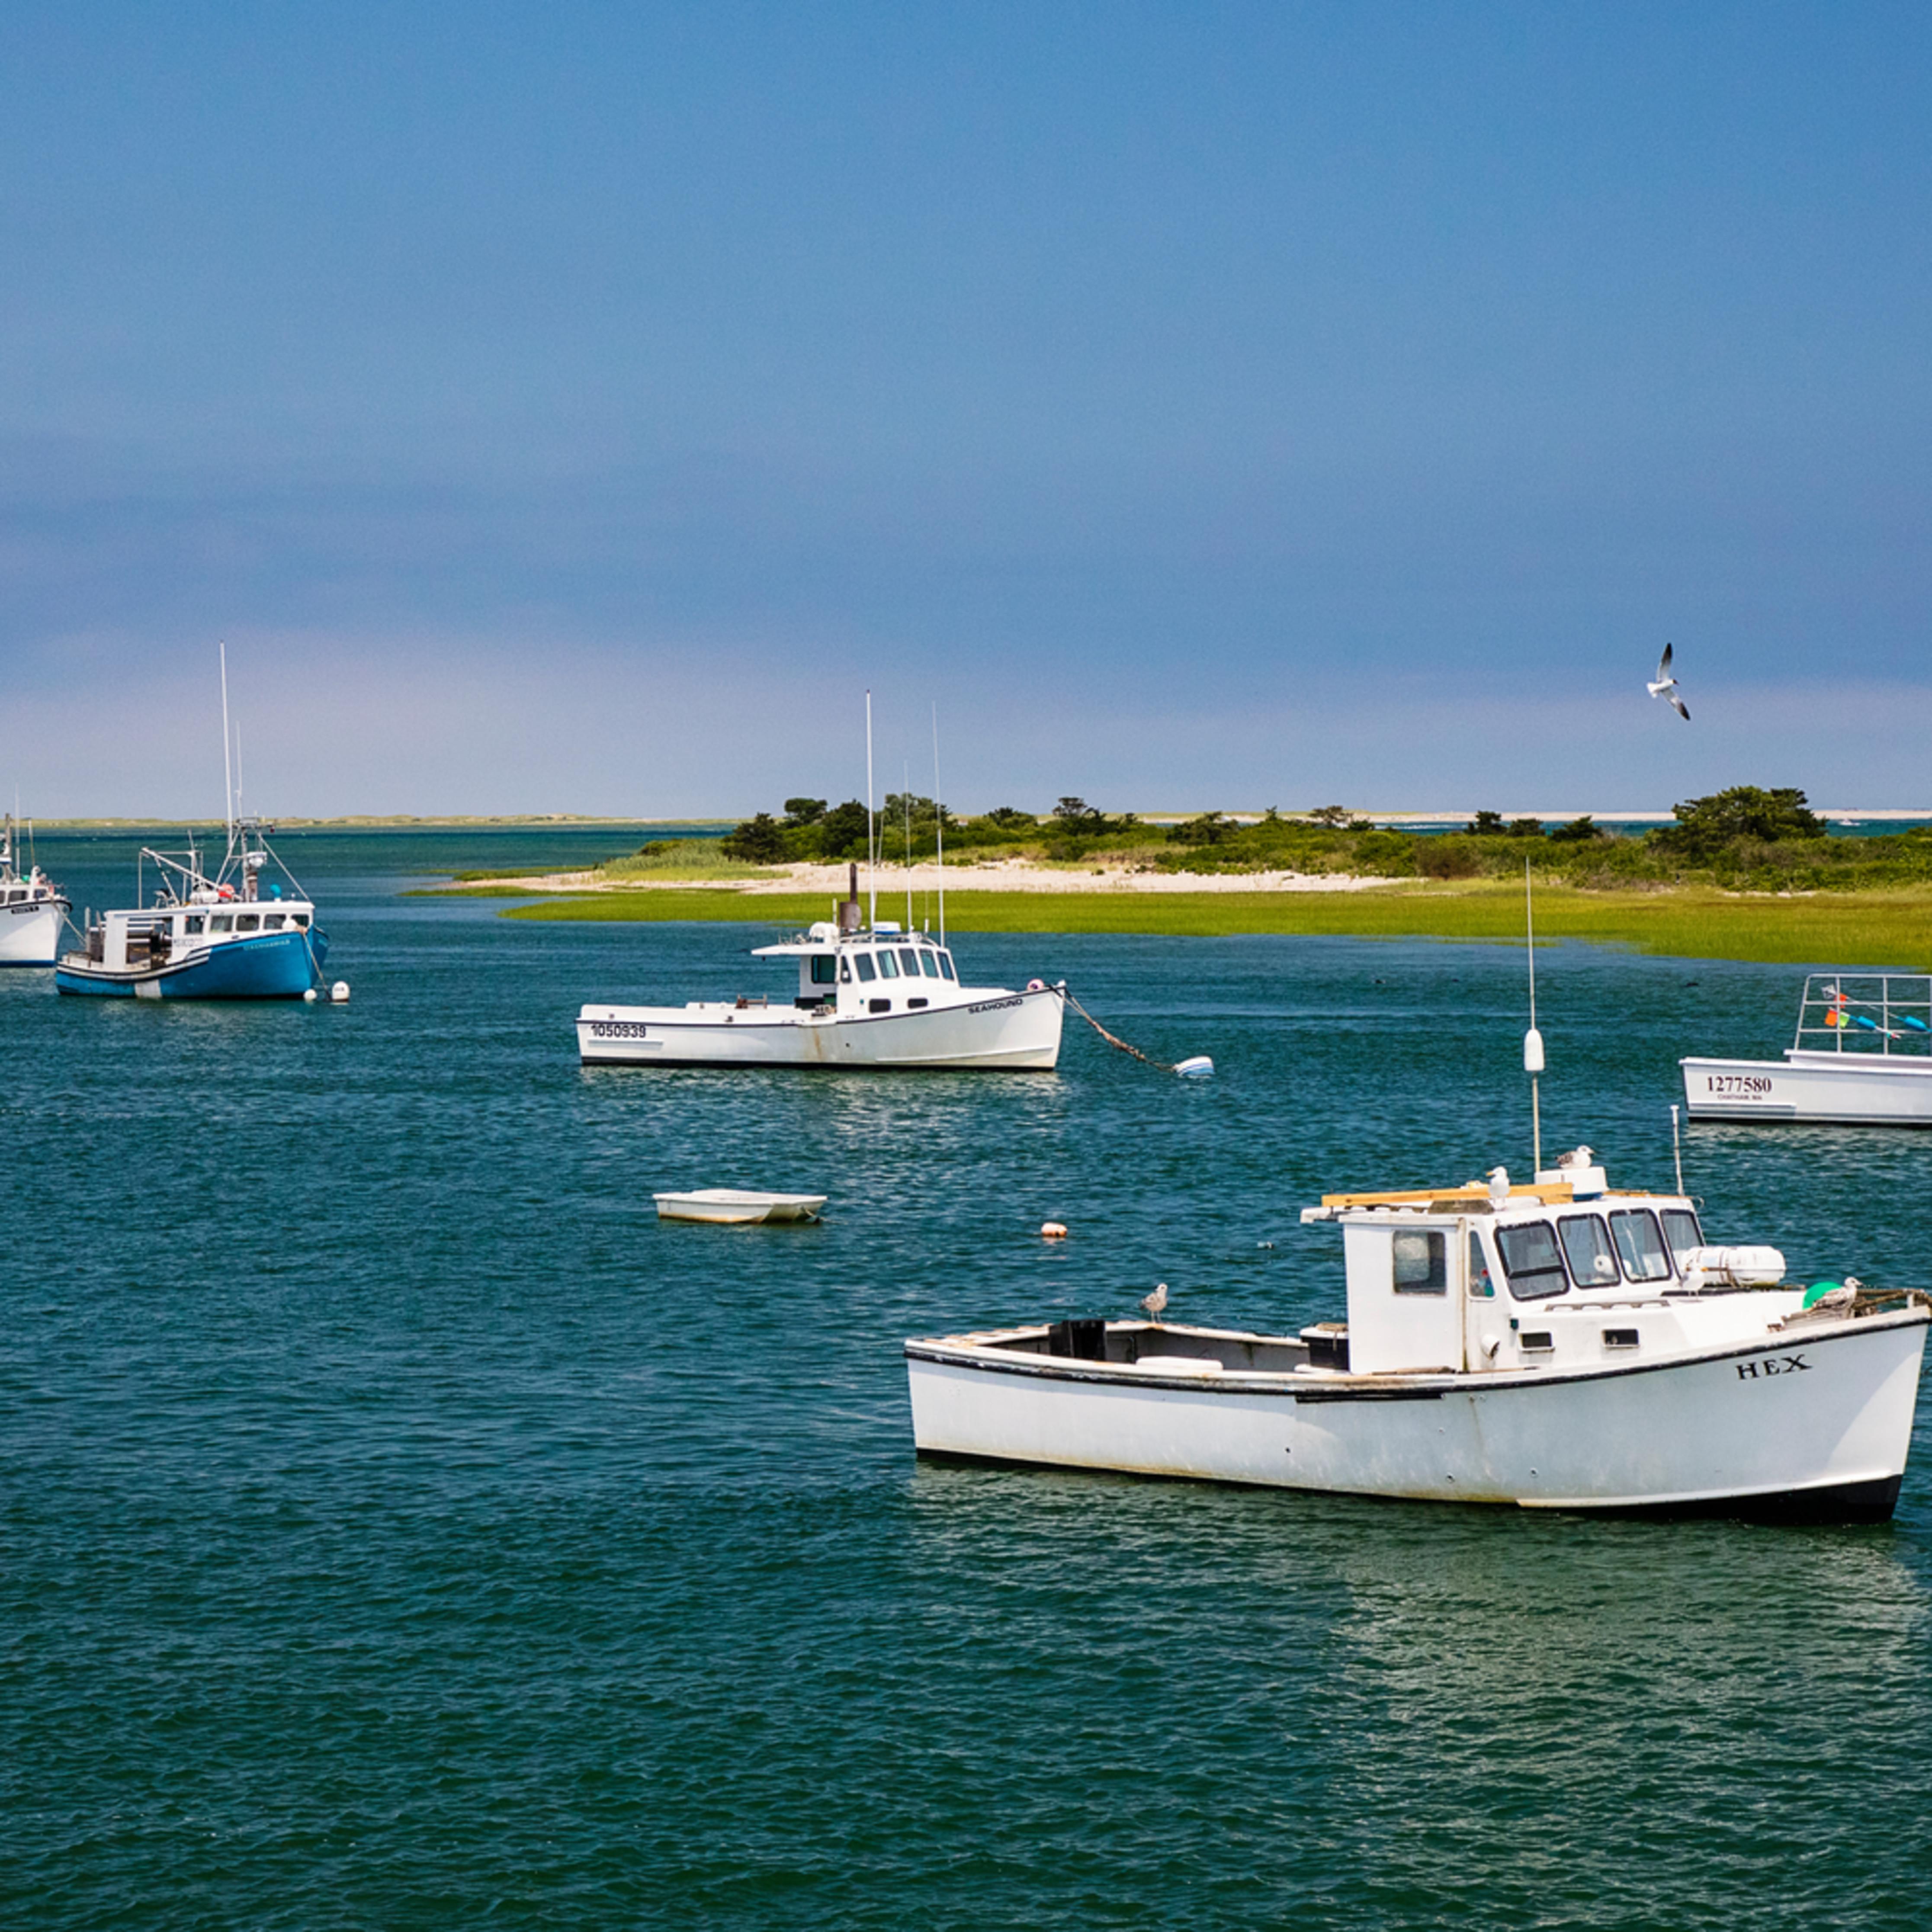 Chatham fish pier boats in harbor summer ztpmxw